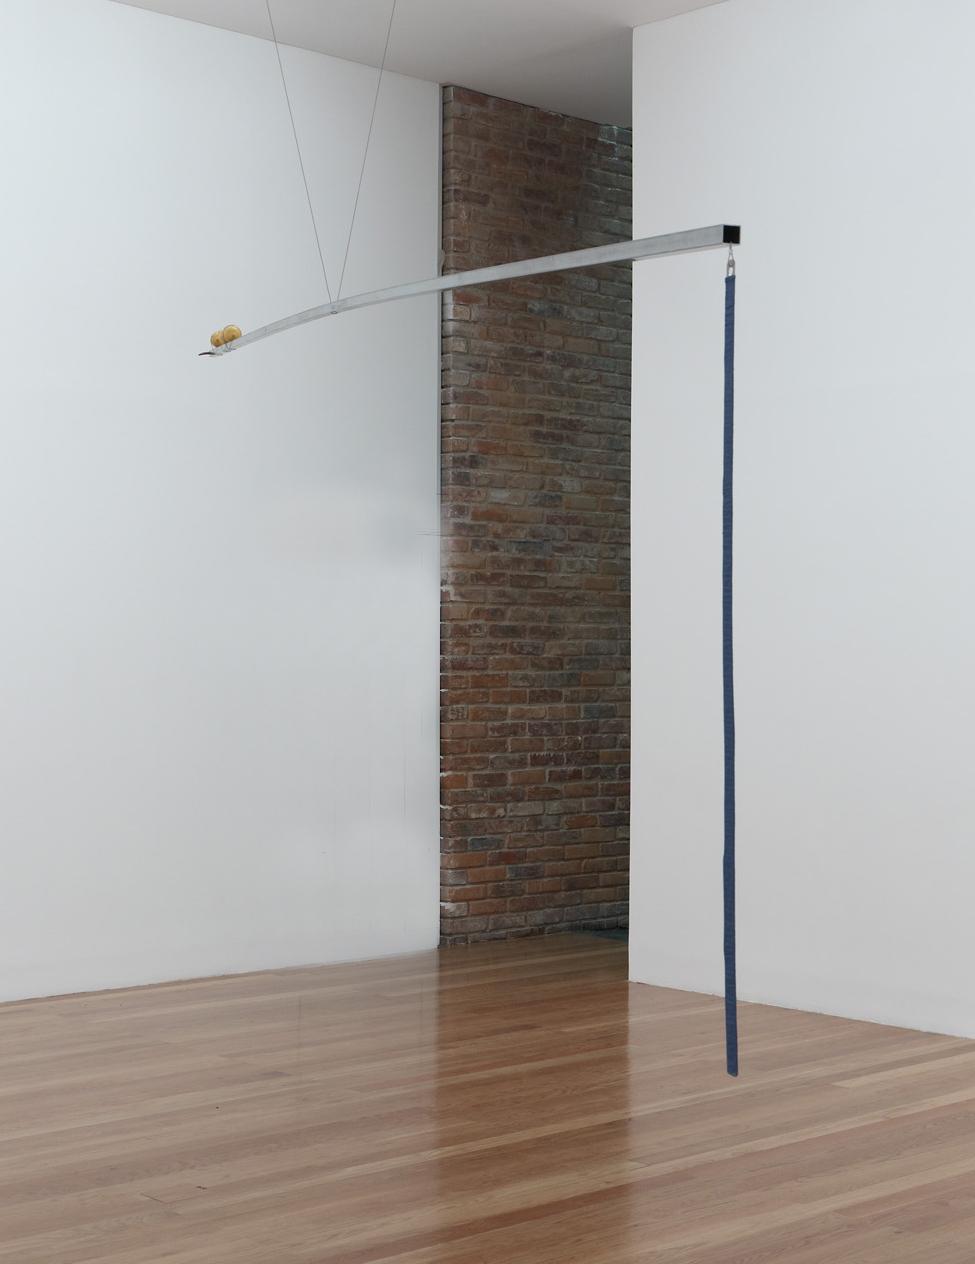 One meter balance, 2012. Barre en fer, tissu, aluminium, bois, citrons. 600 x 2,5 x 2,5 cm Courtesy Galerie Jocelyn Wolff et Katinka Bock. Photo Kristien Daem